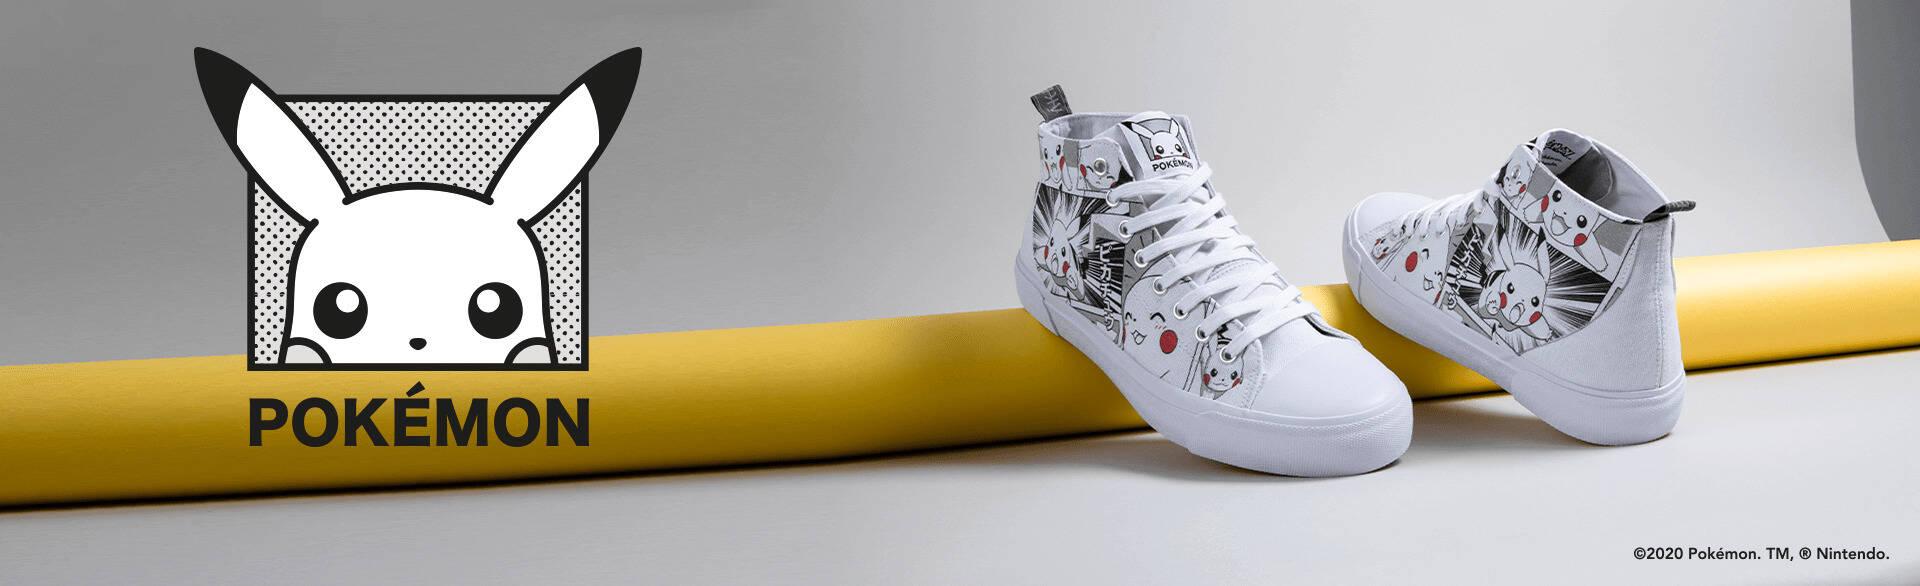 banner scarpe pokemon zavvi